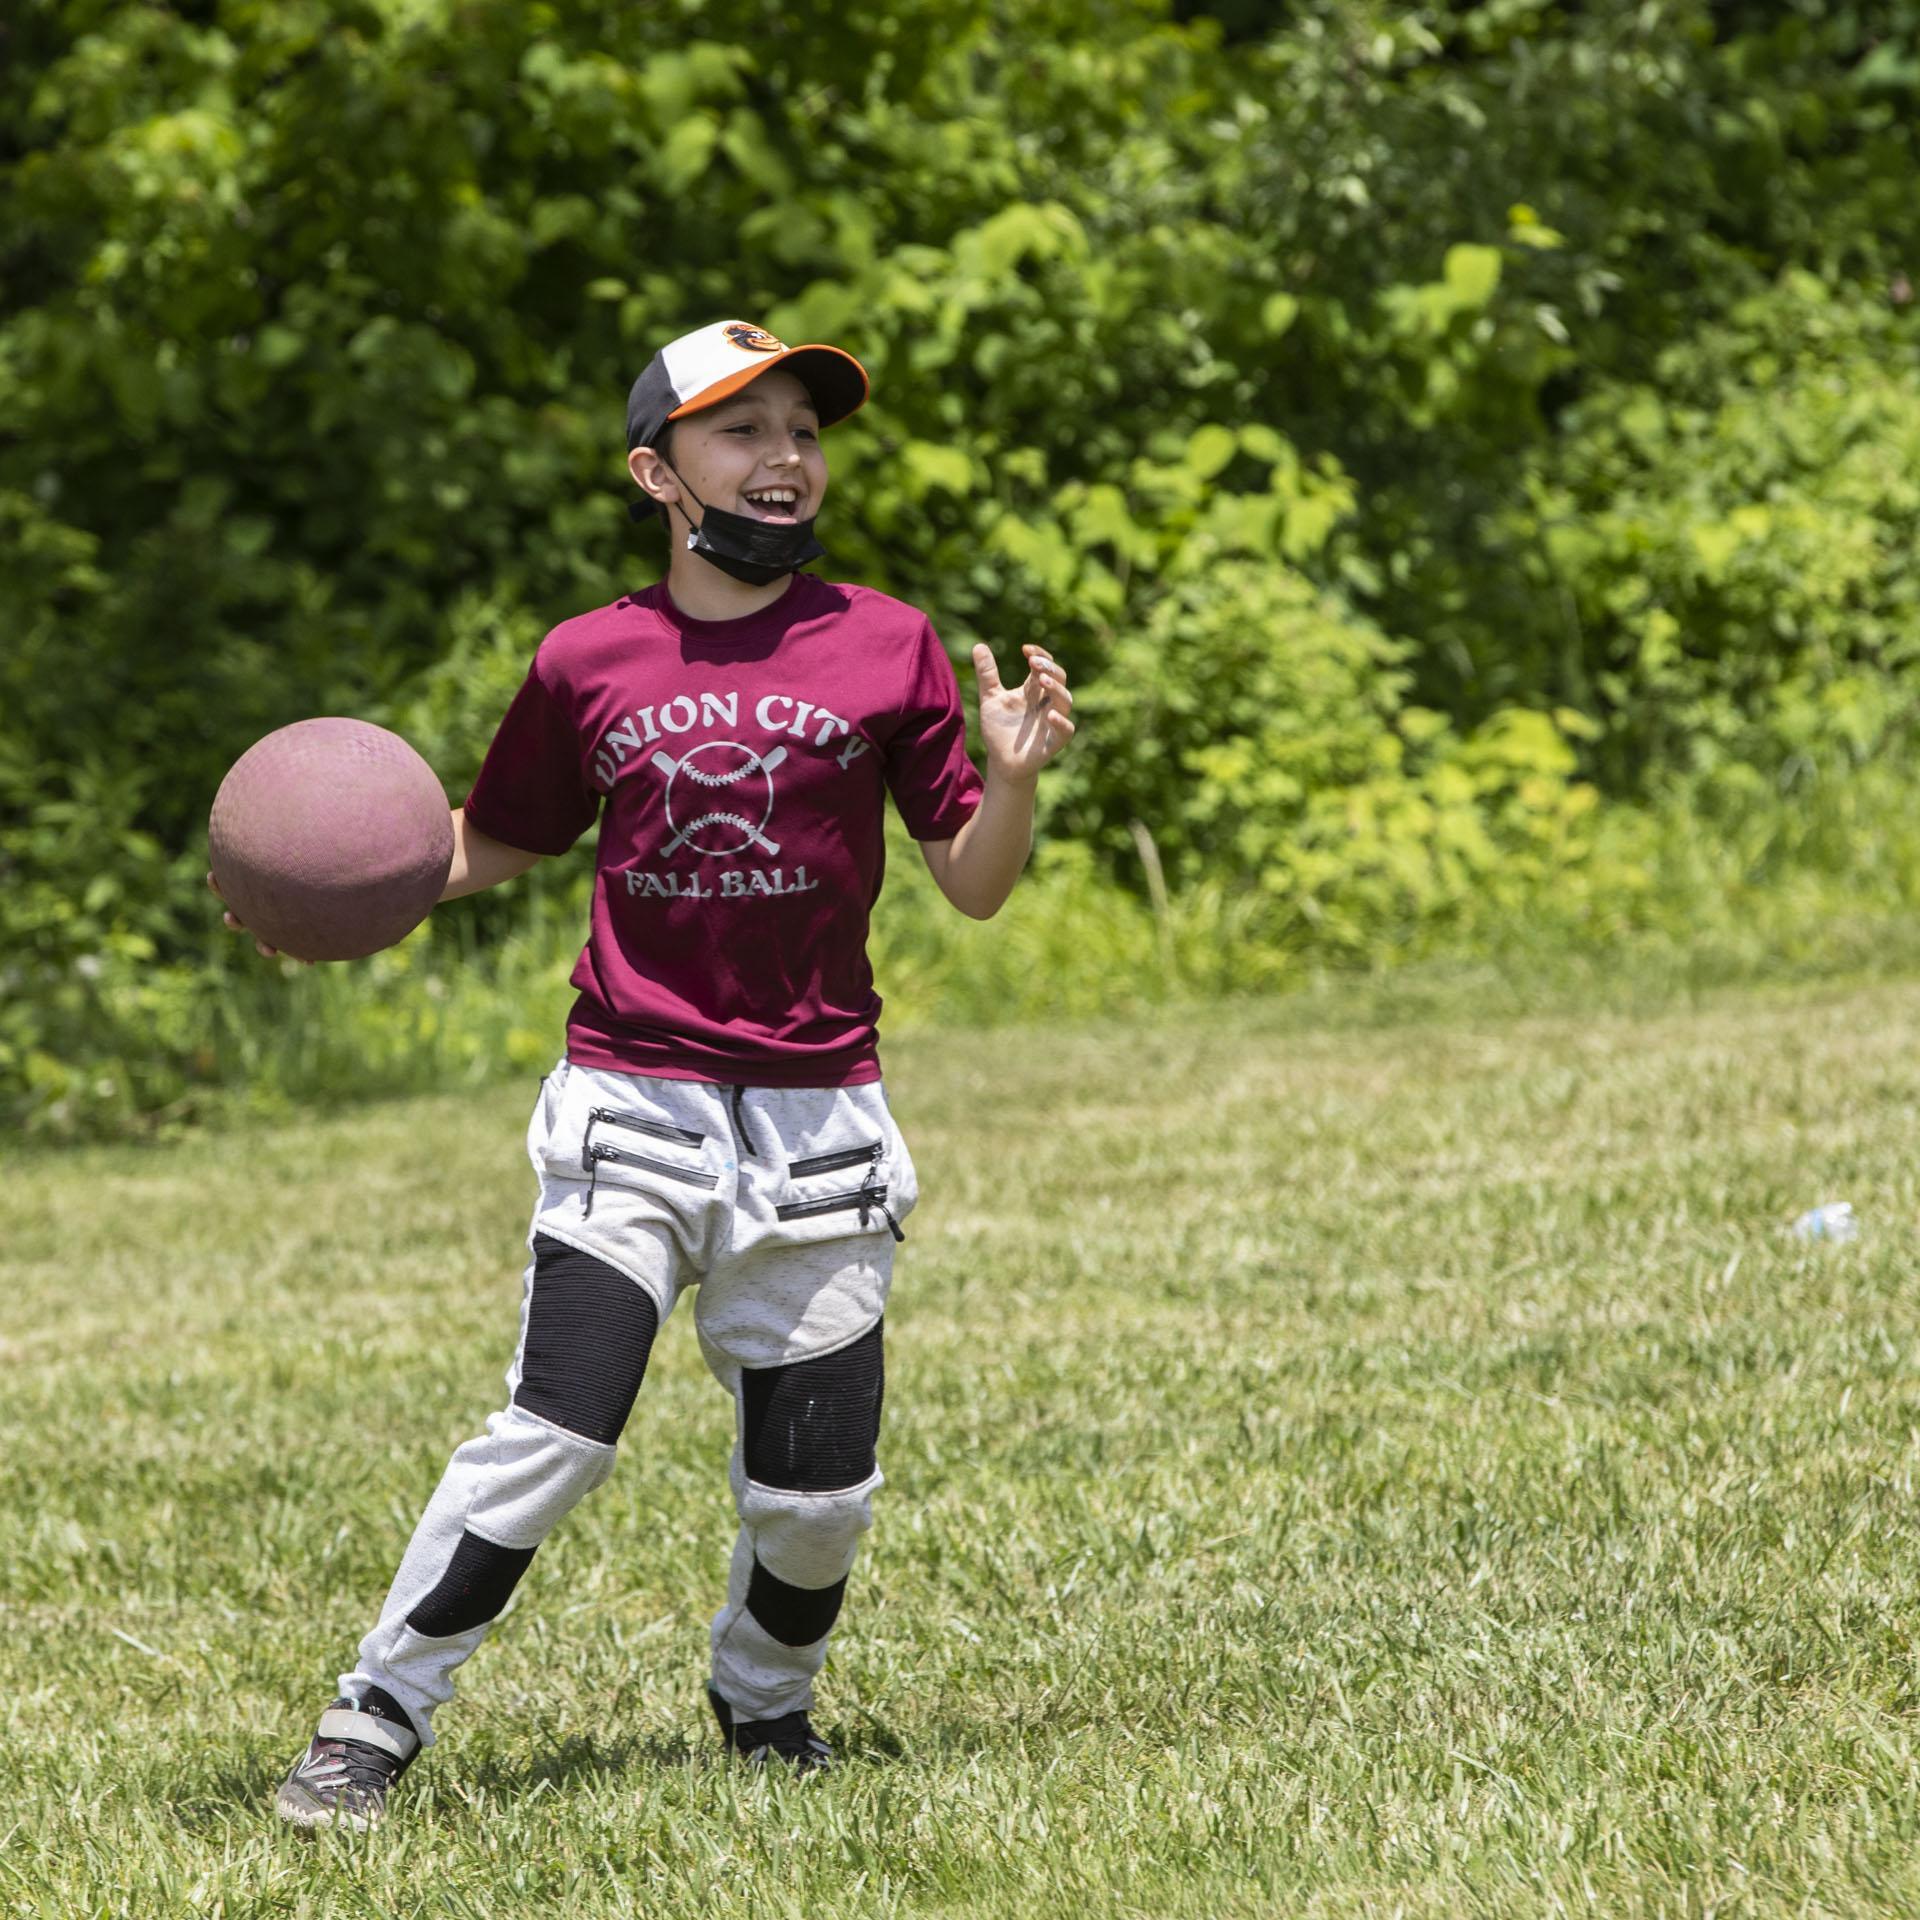 Boy holding kick ball